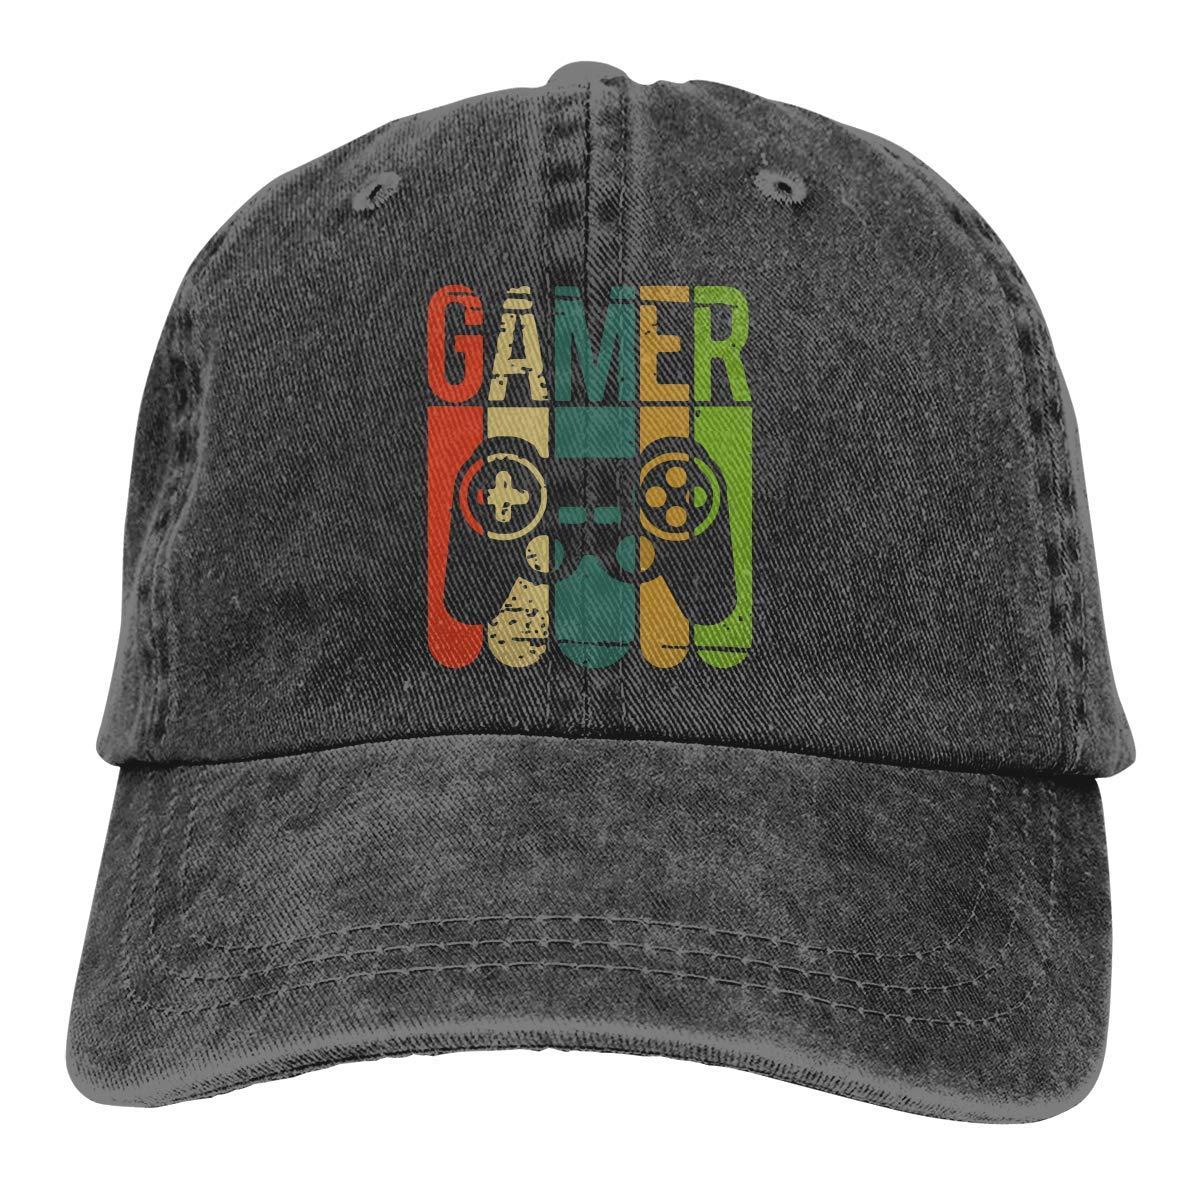 cvbnch Gorras de béisbol Hombre/Mujer,Baseball Caps für Herren ...